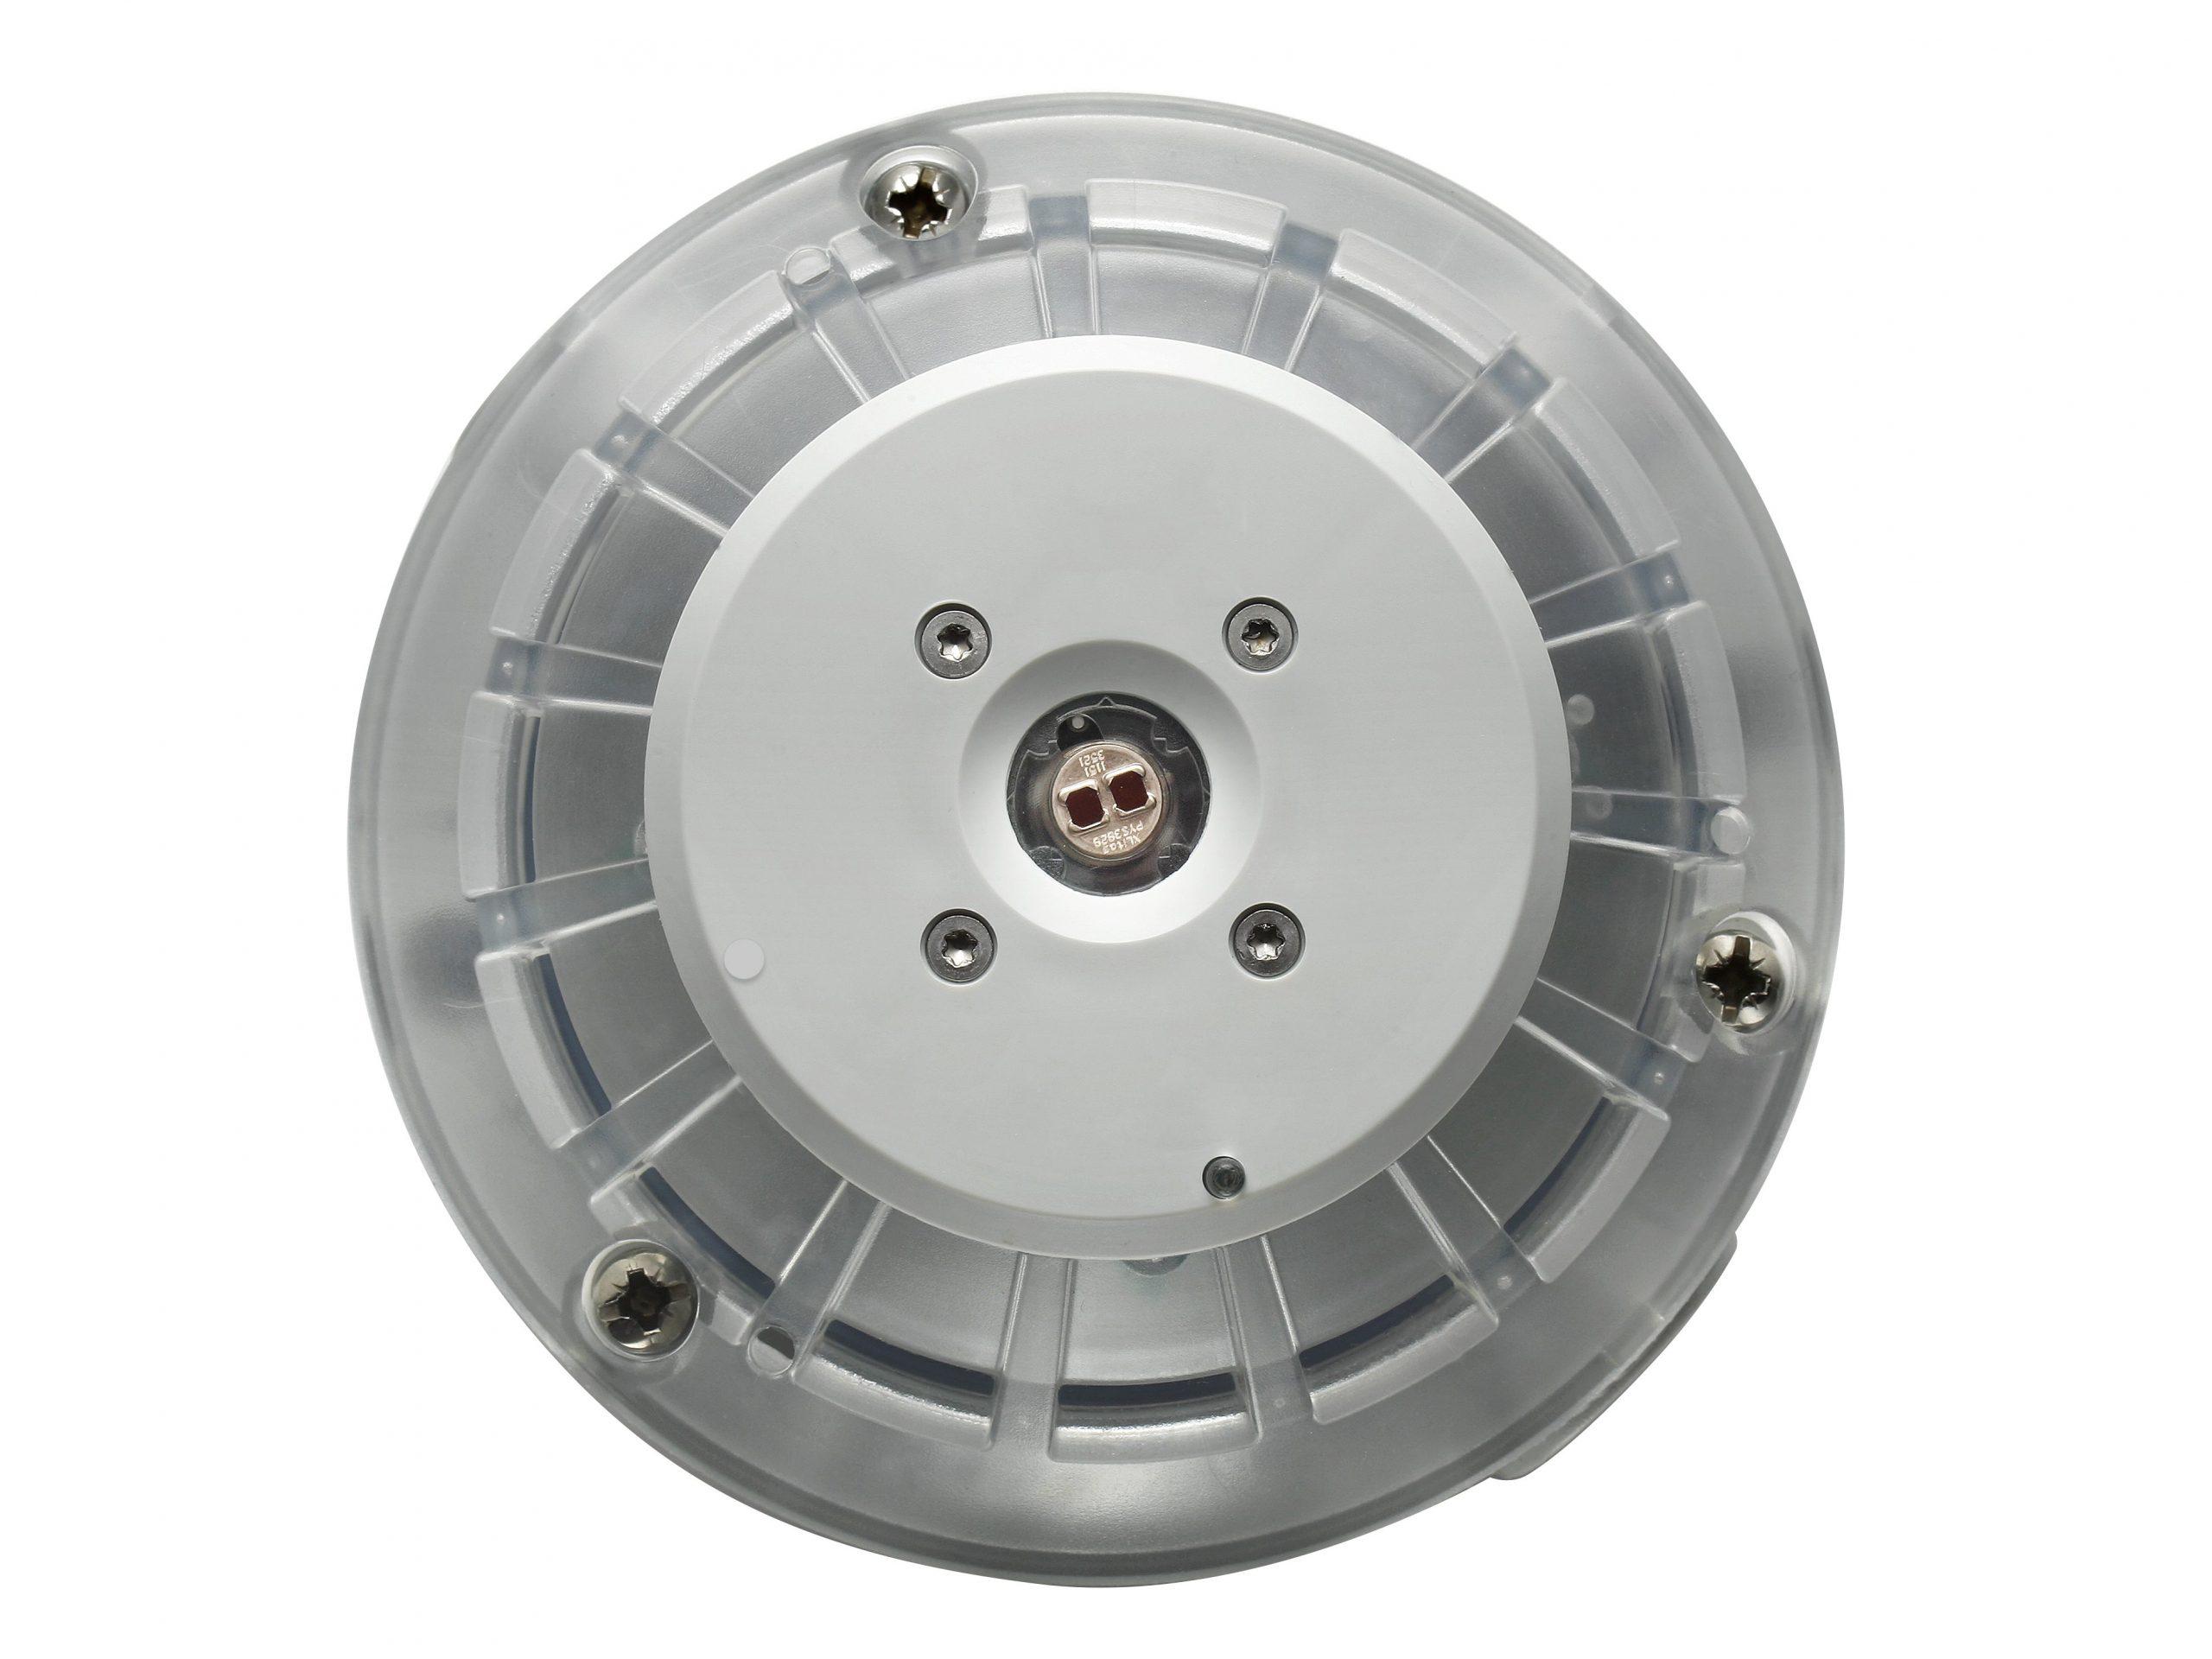 Autrosystems Vlamdetector BG-201